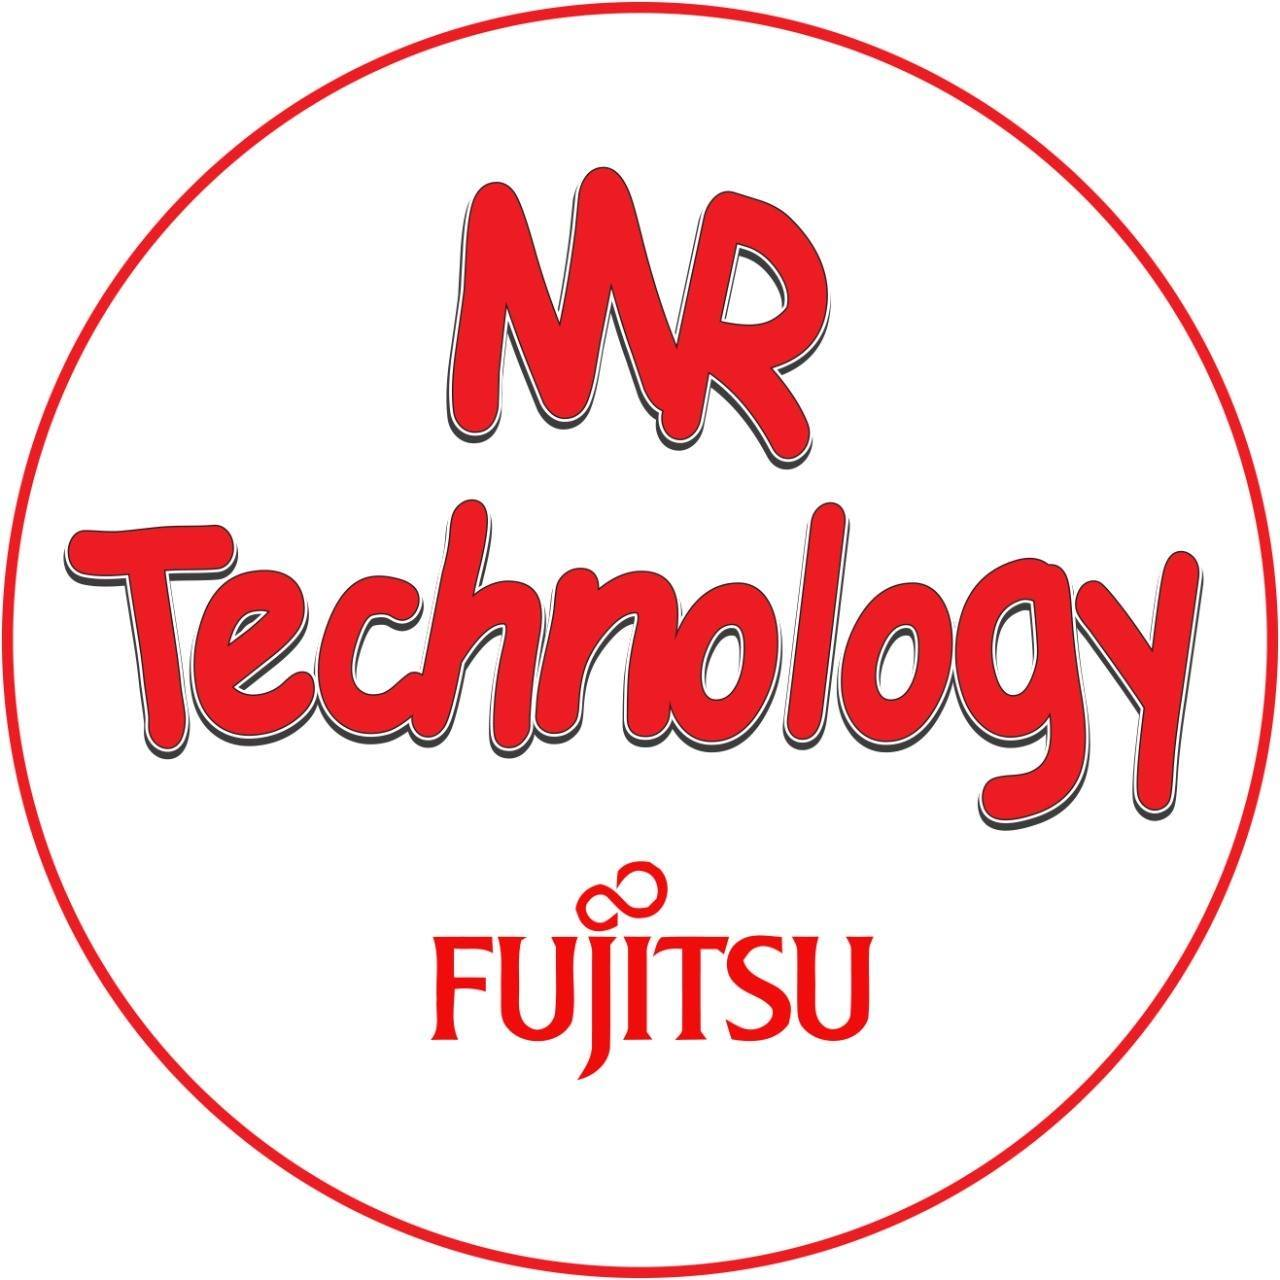 MR technology